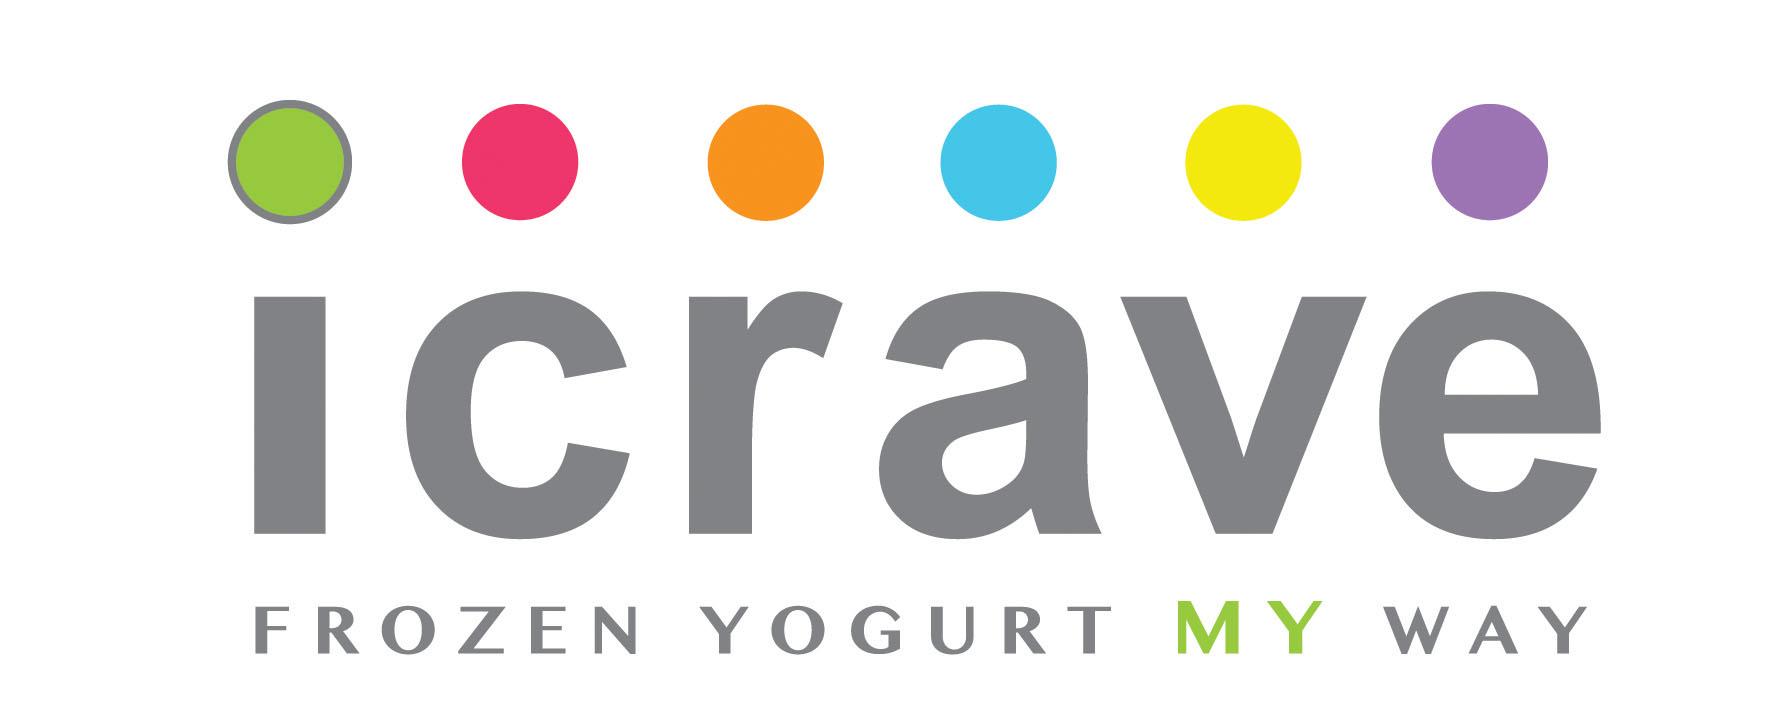 iCrave-LOGO-FINAL-02.jpg